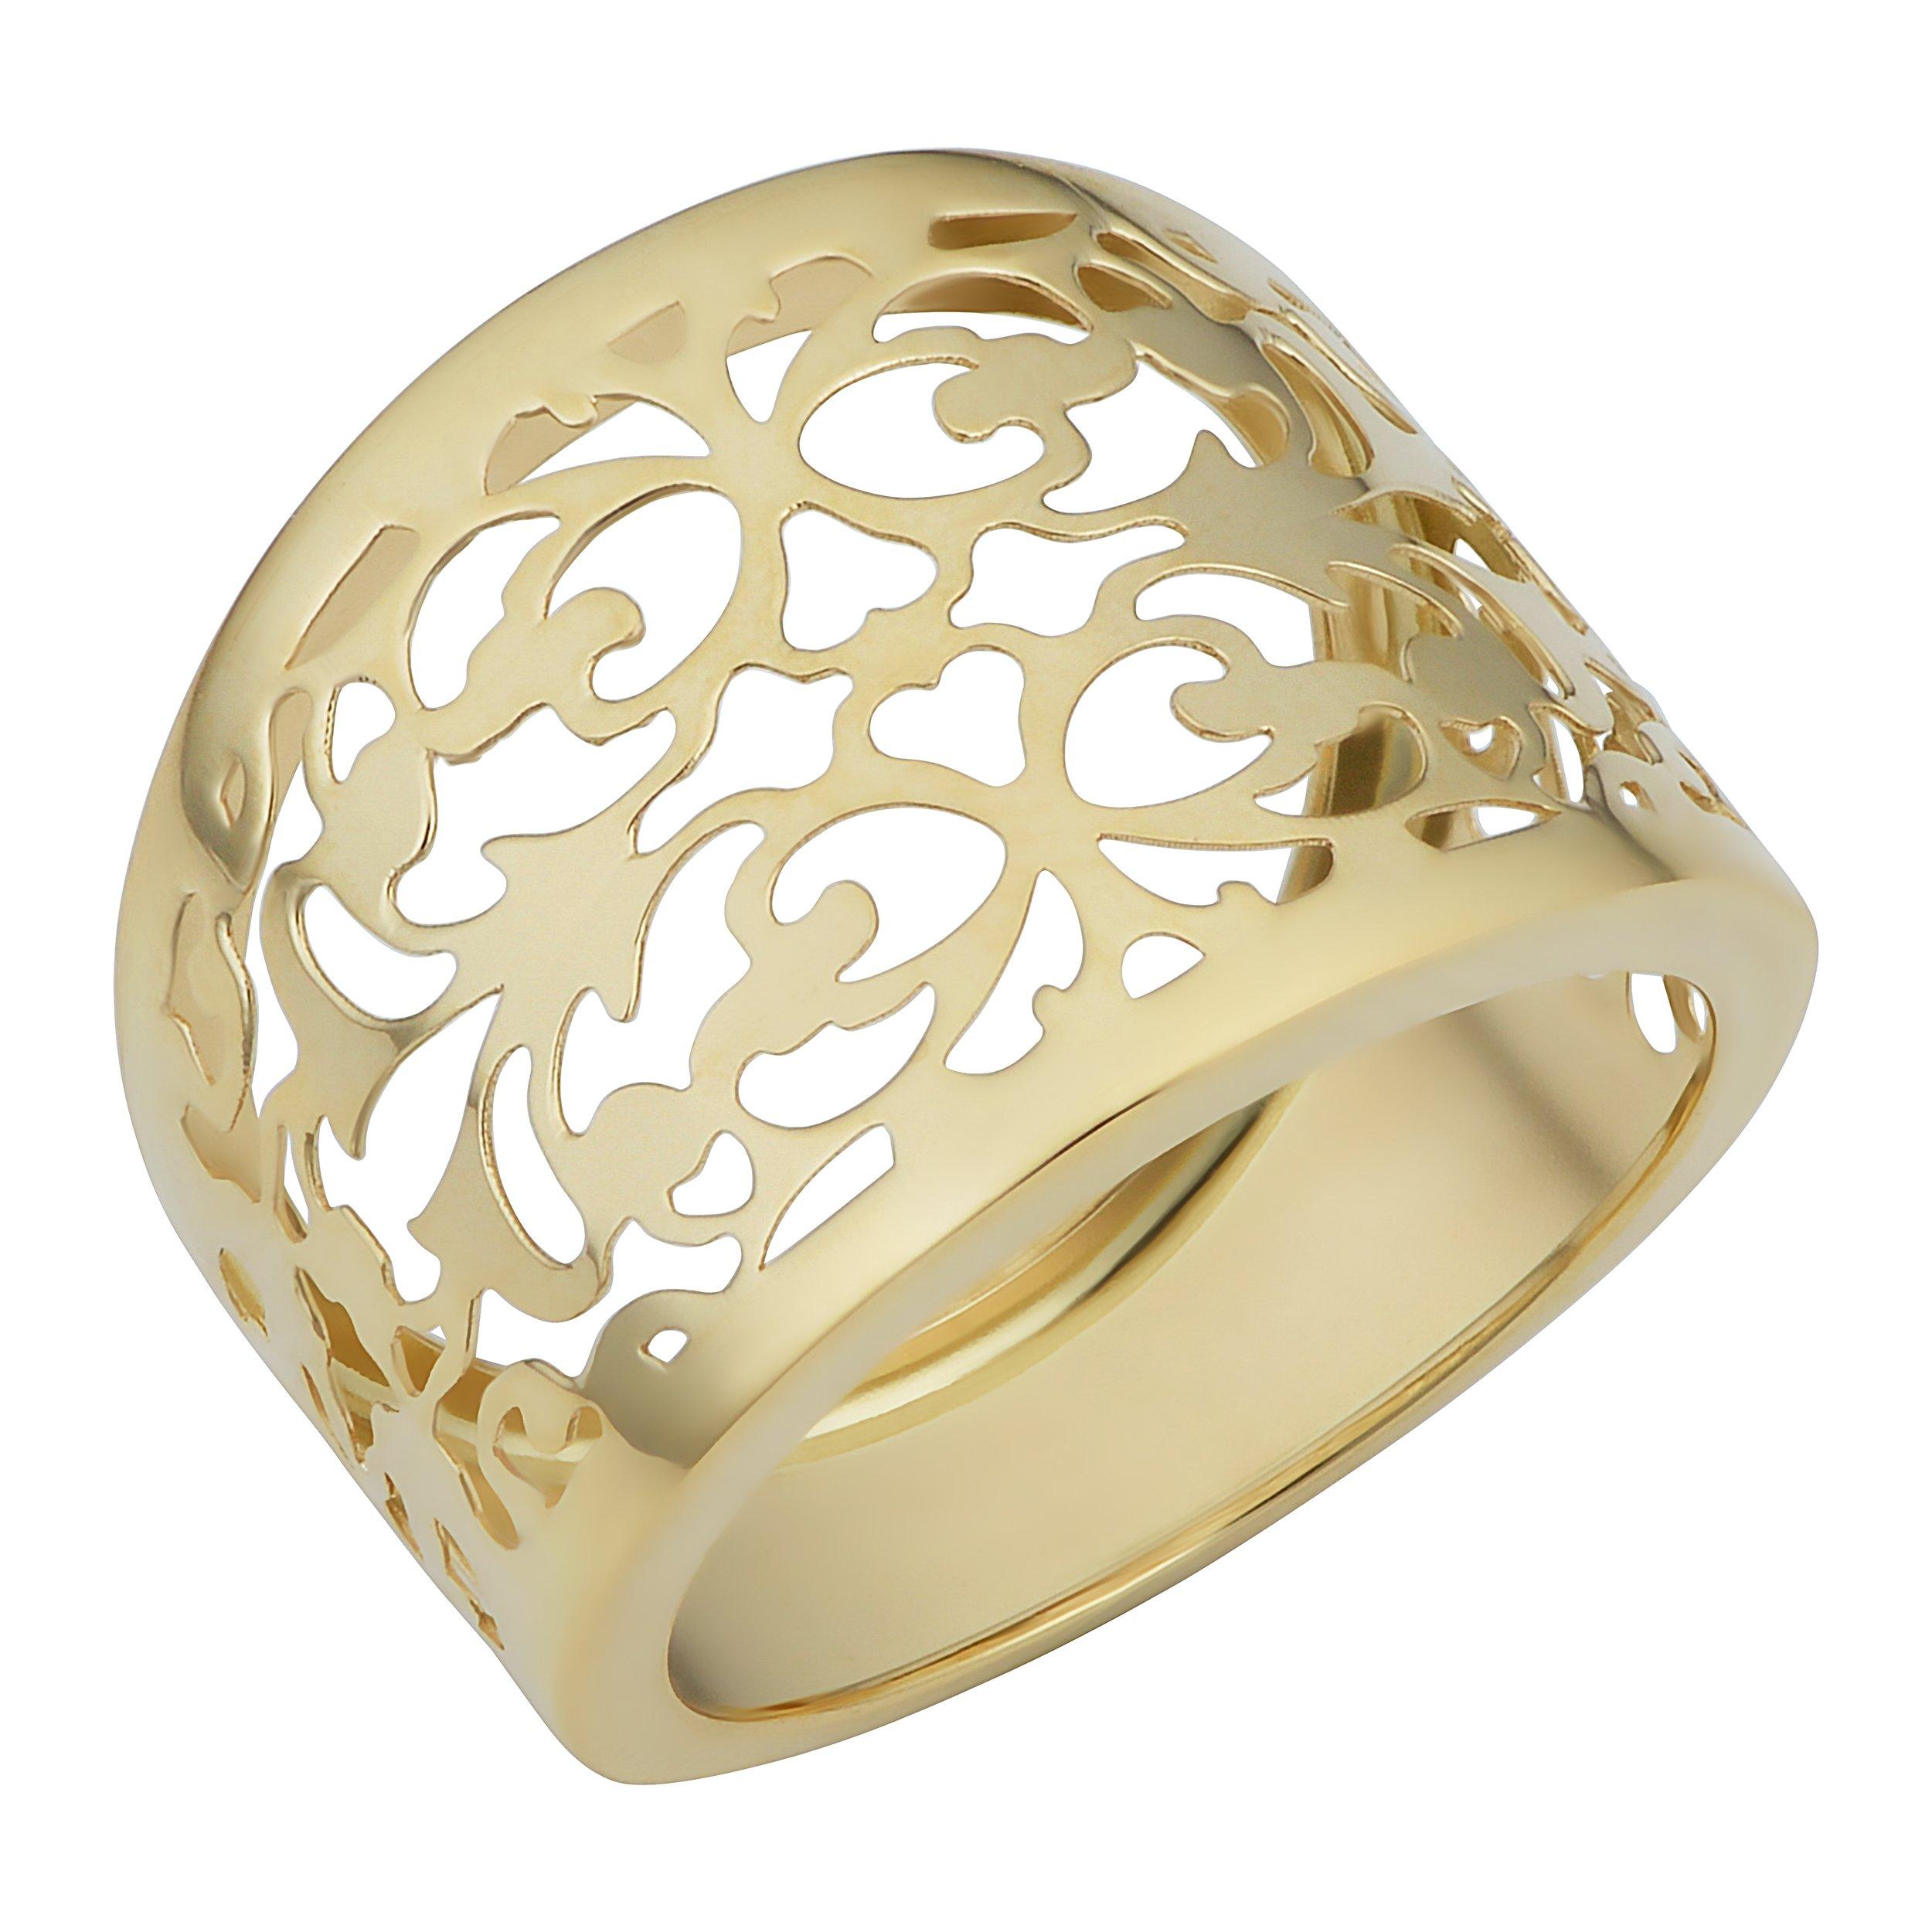 Kooljewelry 14k Yellow Gold Filgree Cigar Band Ring (size 7)